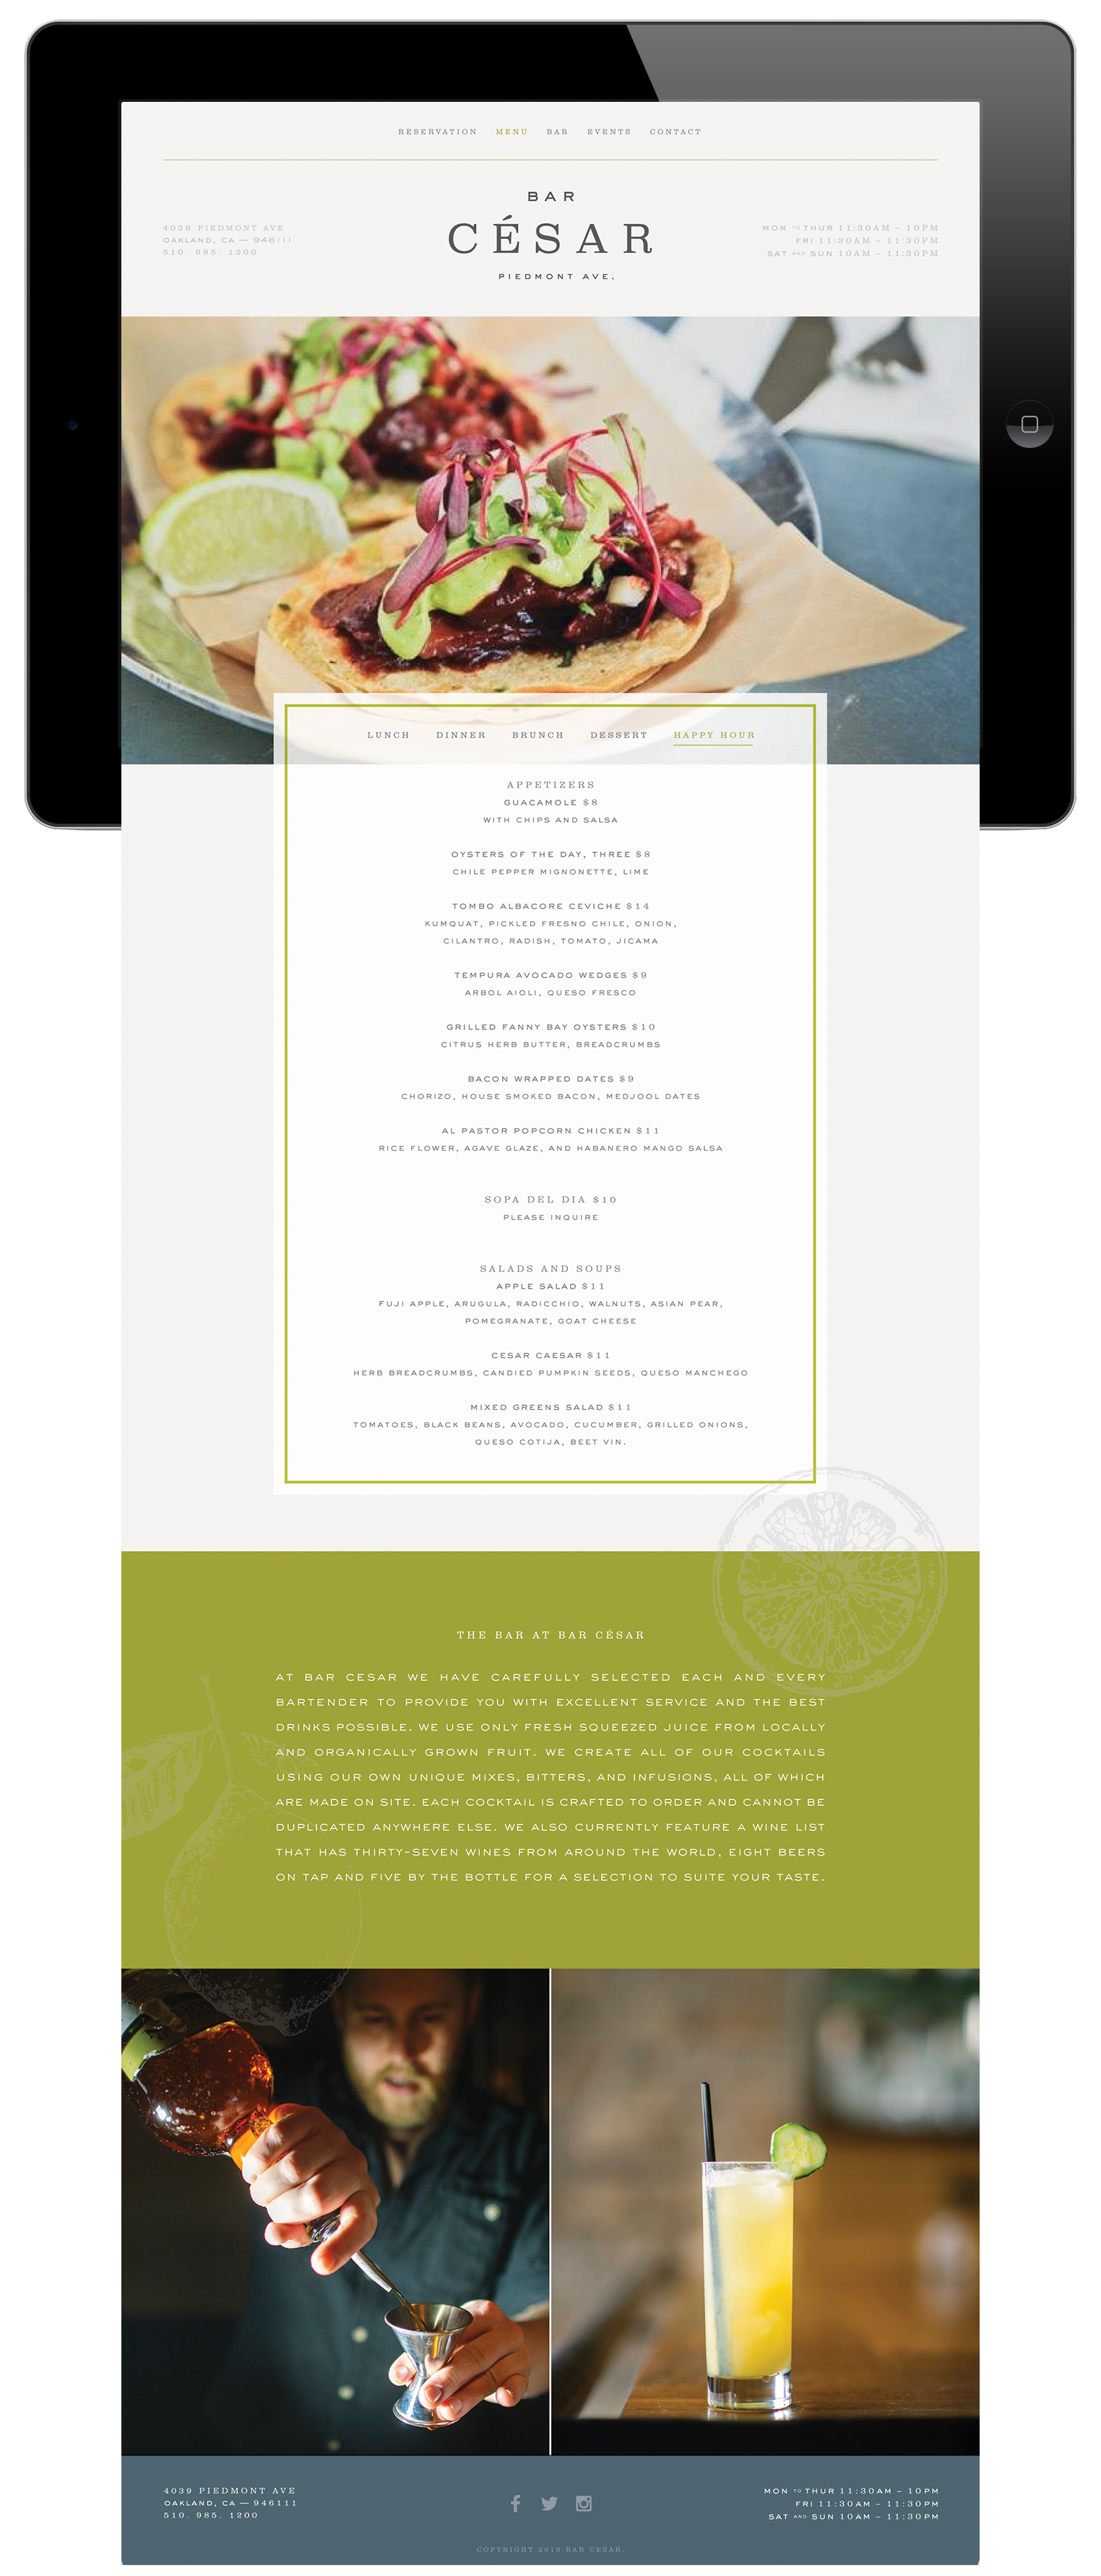 edition-design-co_bar-cesar_web_mobile_03.png